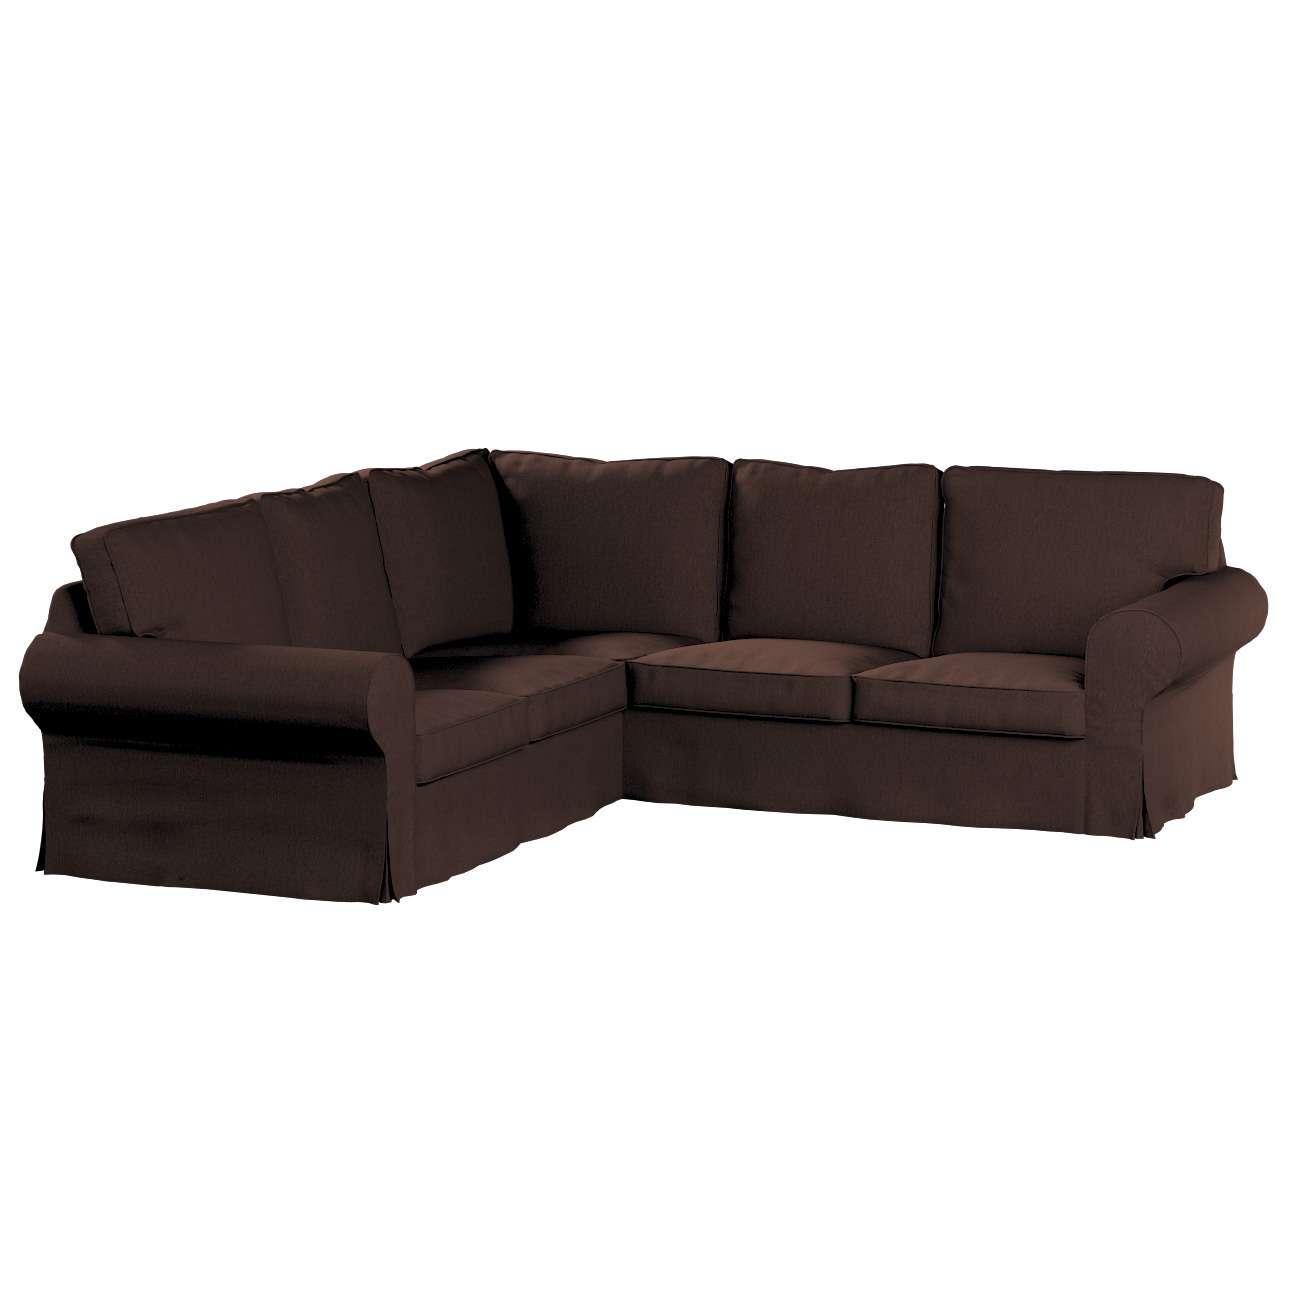 Ektorp kampinė sofa Ektorp kampinė sofa kolekcijoje Chenille, audinys: 702-18